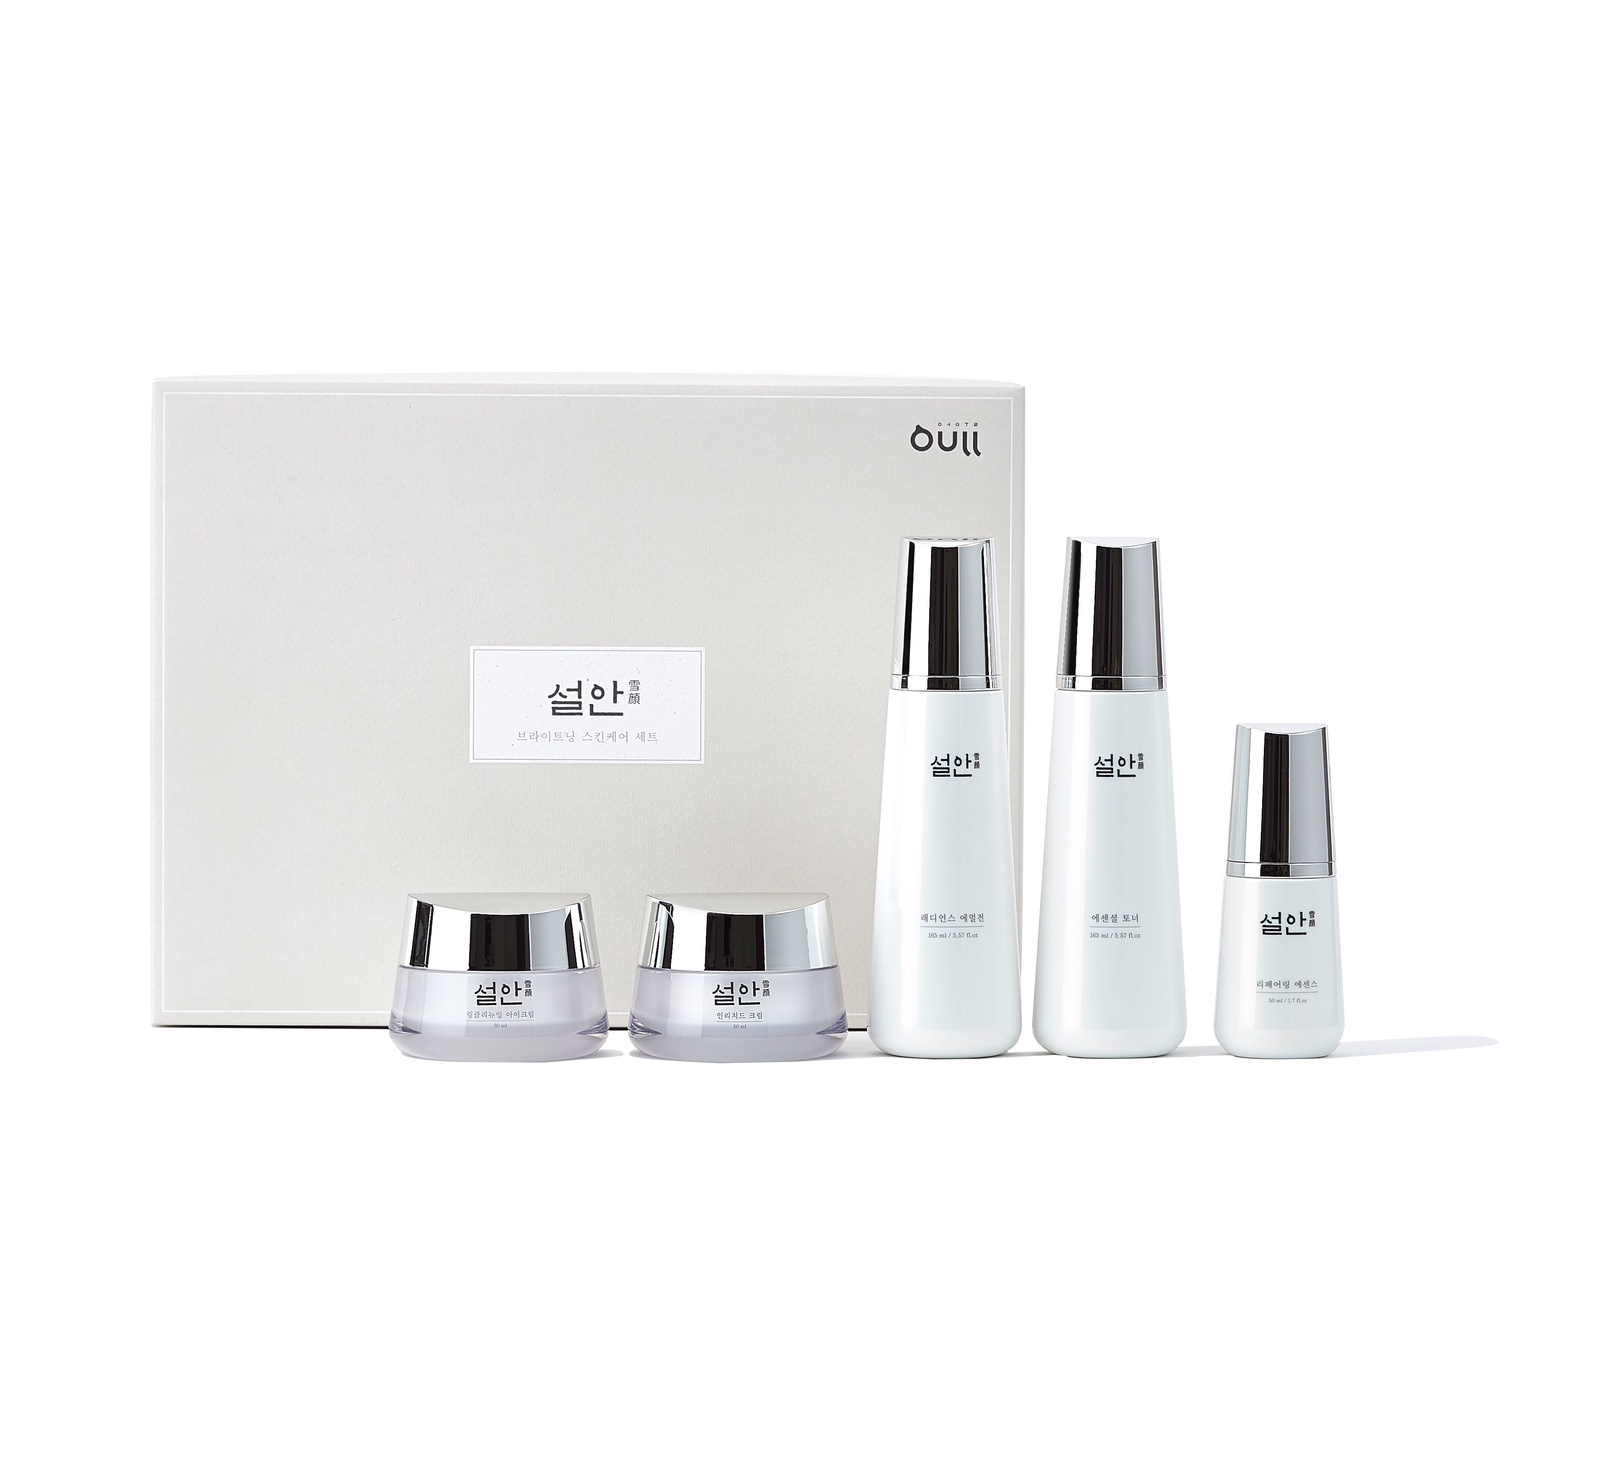 Набор косметики для ухода за кожей Oull Восстанавливающий молодость кожи набор по уходу за кожей лица Sulan Brightening Skin Care Set